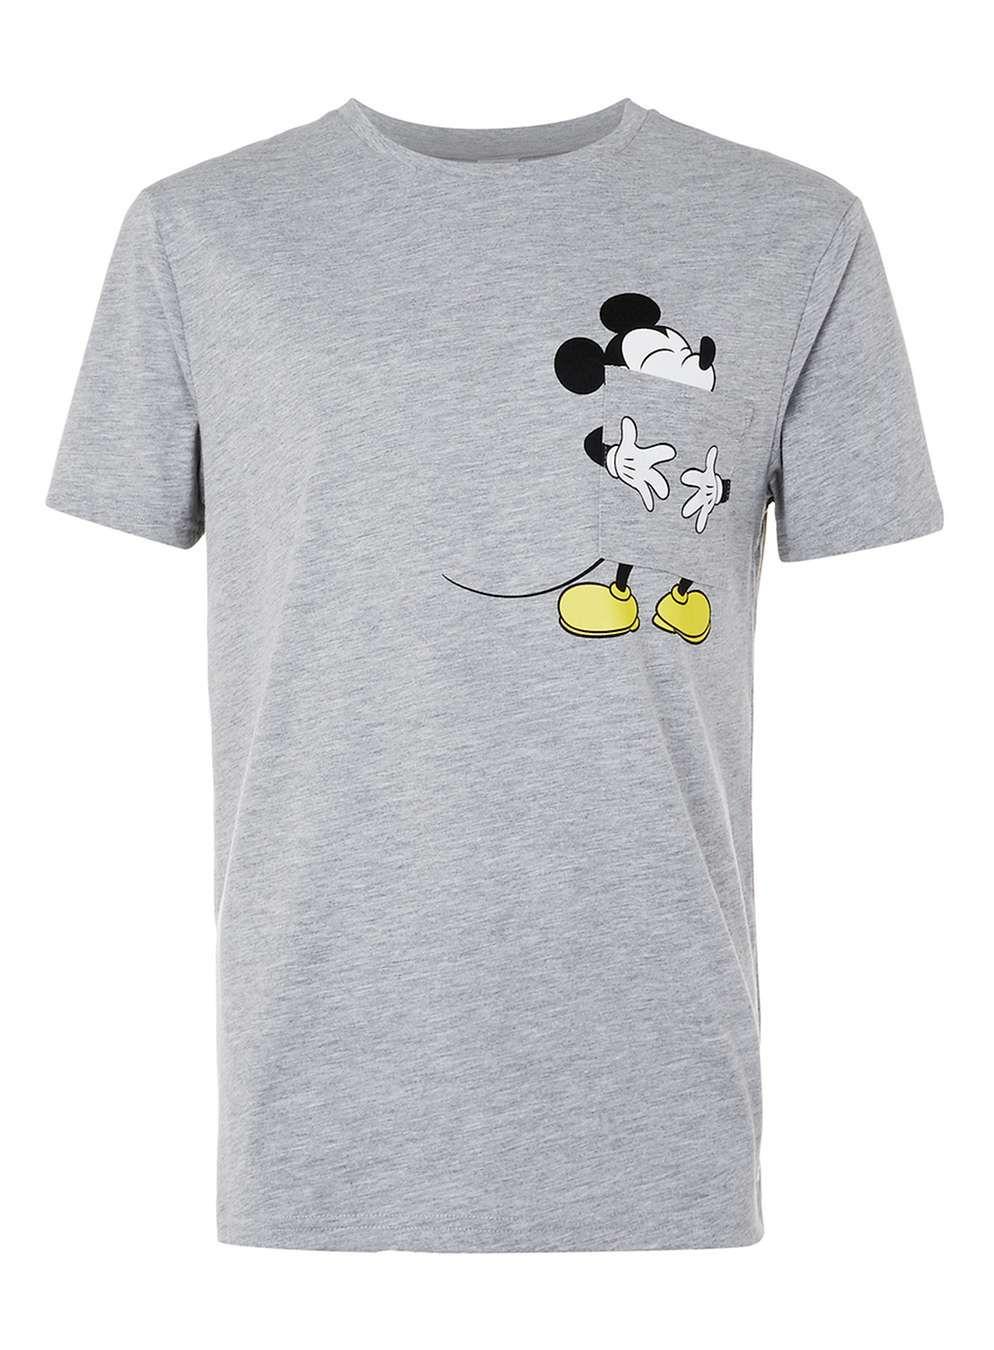 Black t shirt topman - Grey Marl Mickey Mouse Tongue Print T Shirt